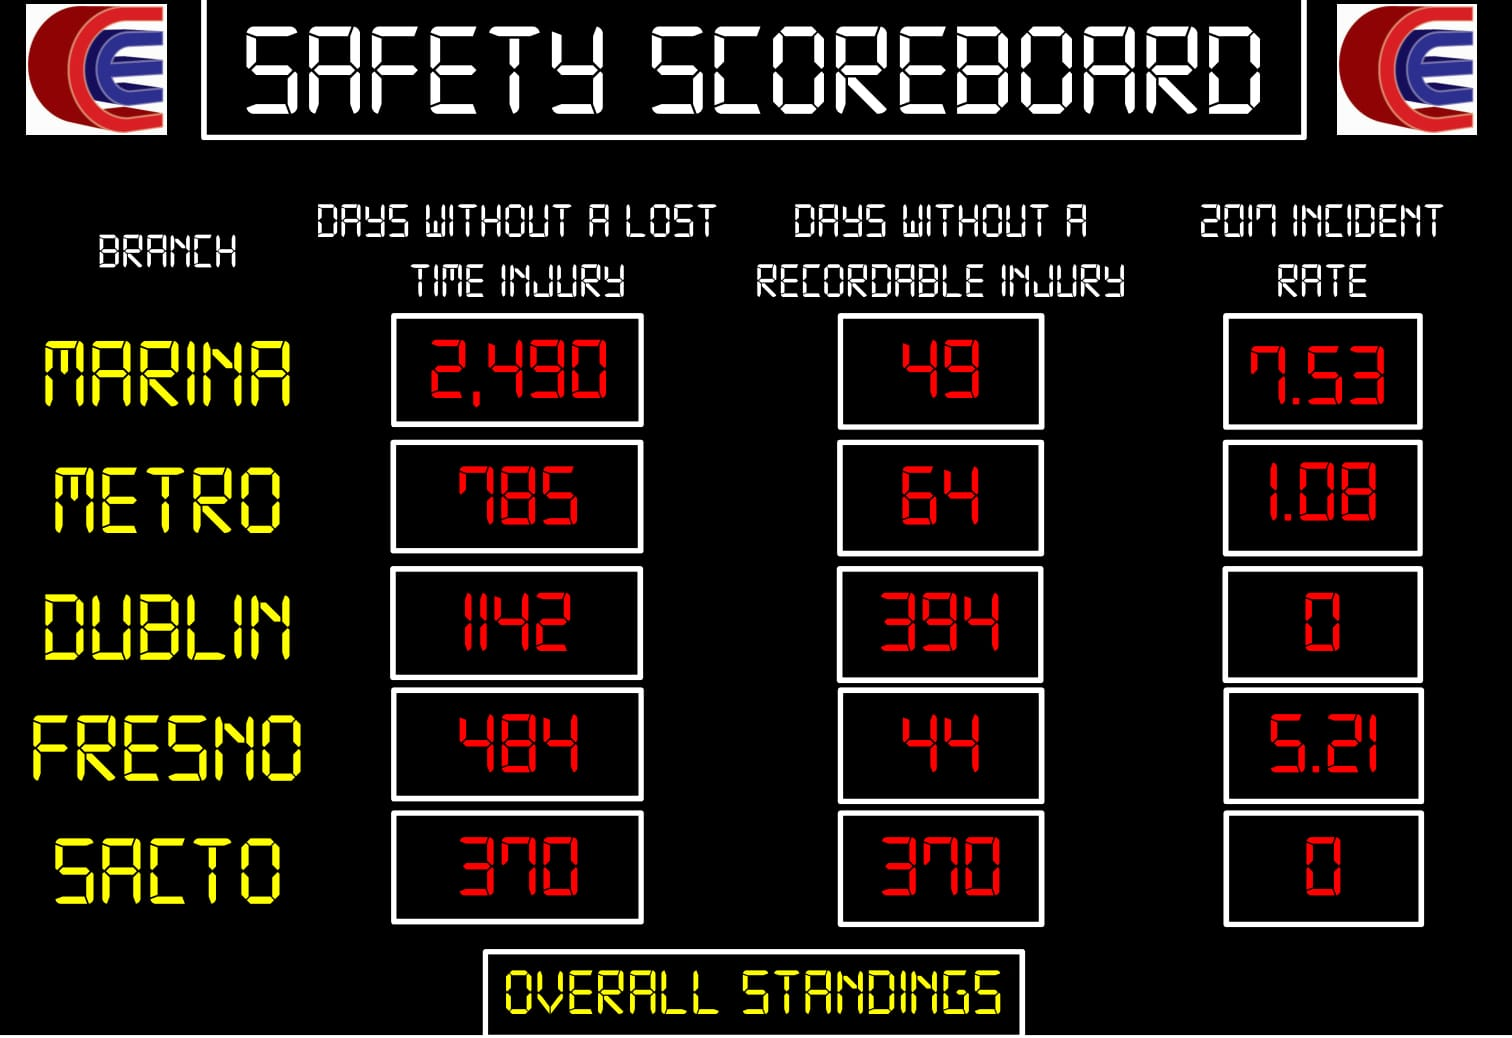 Safety Scoreboard-1